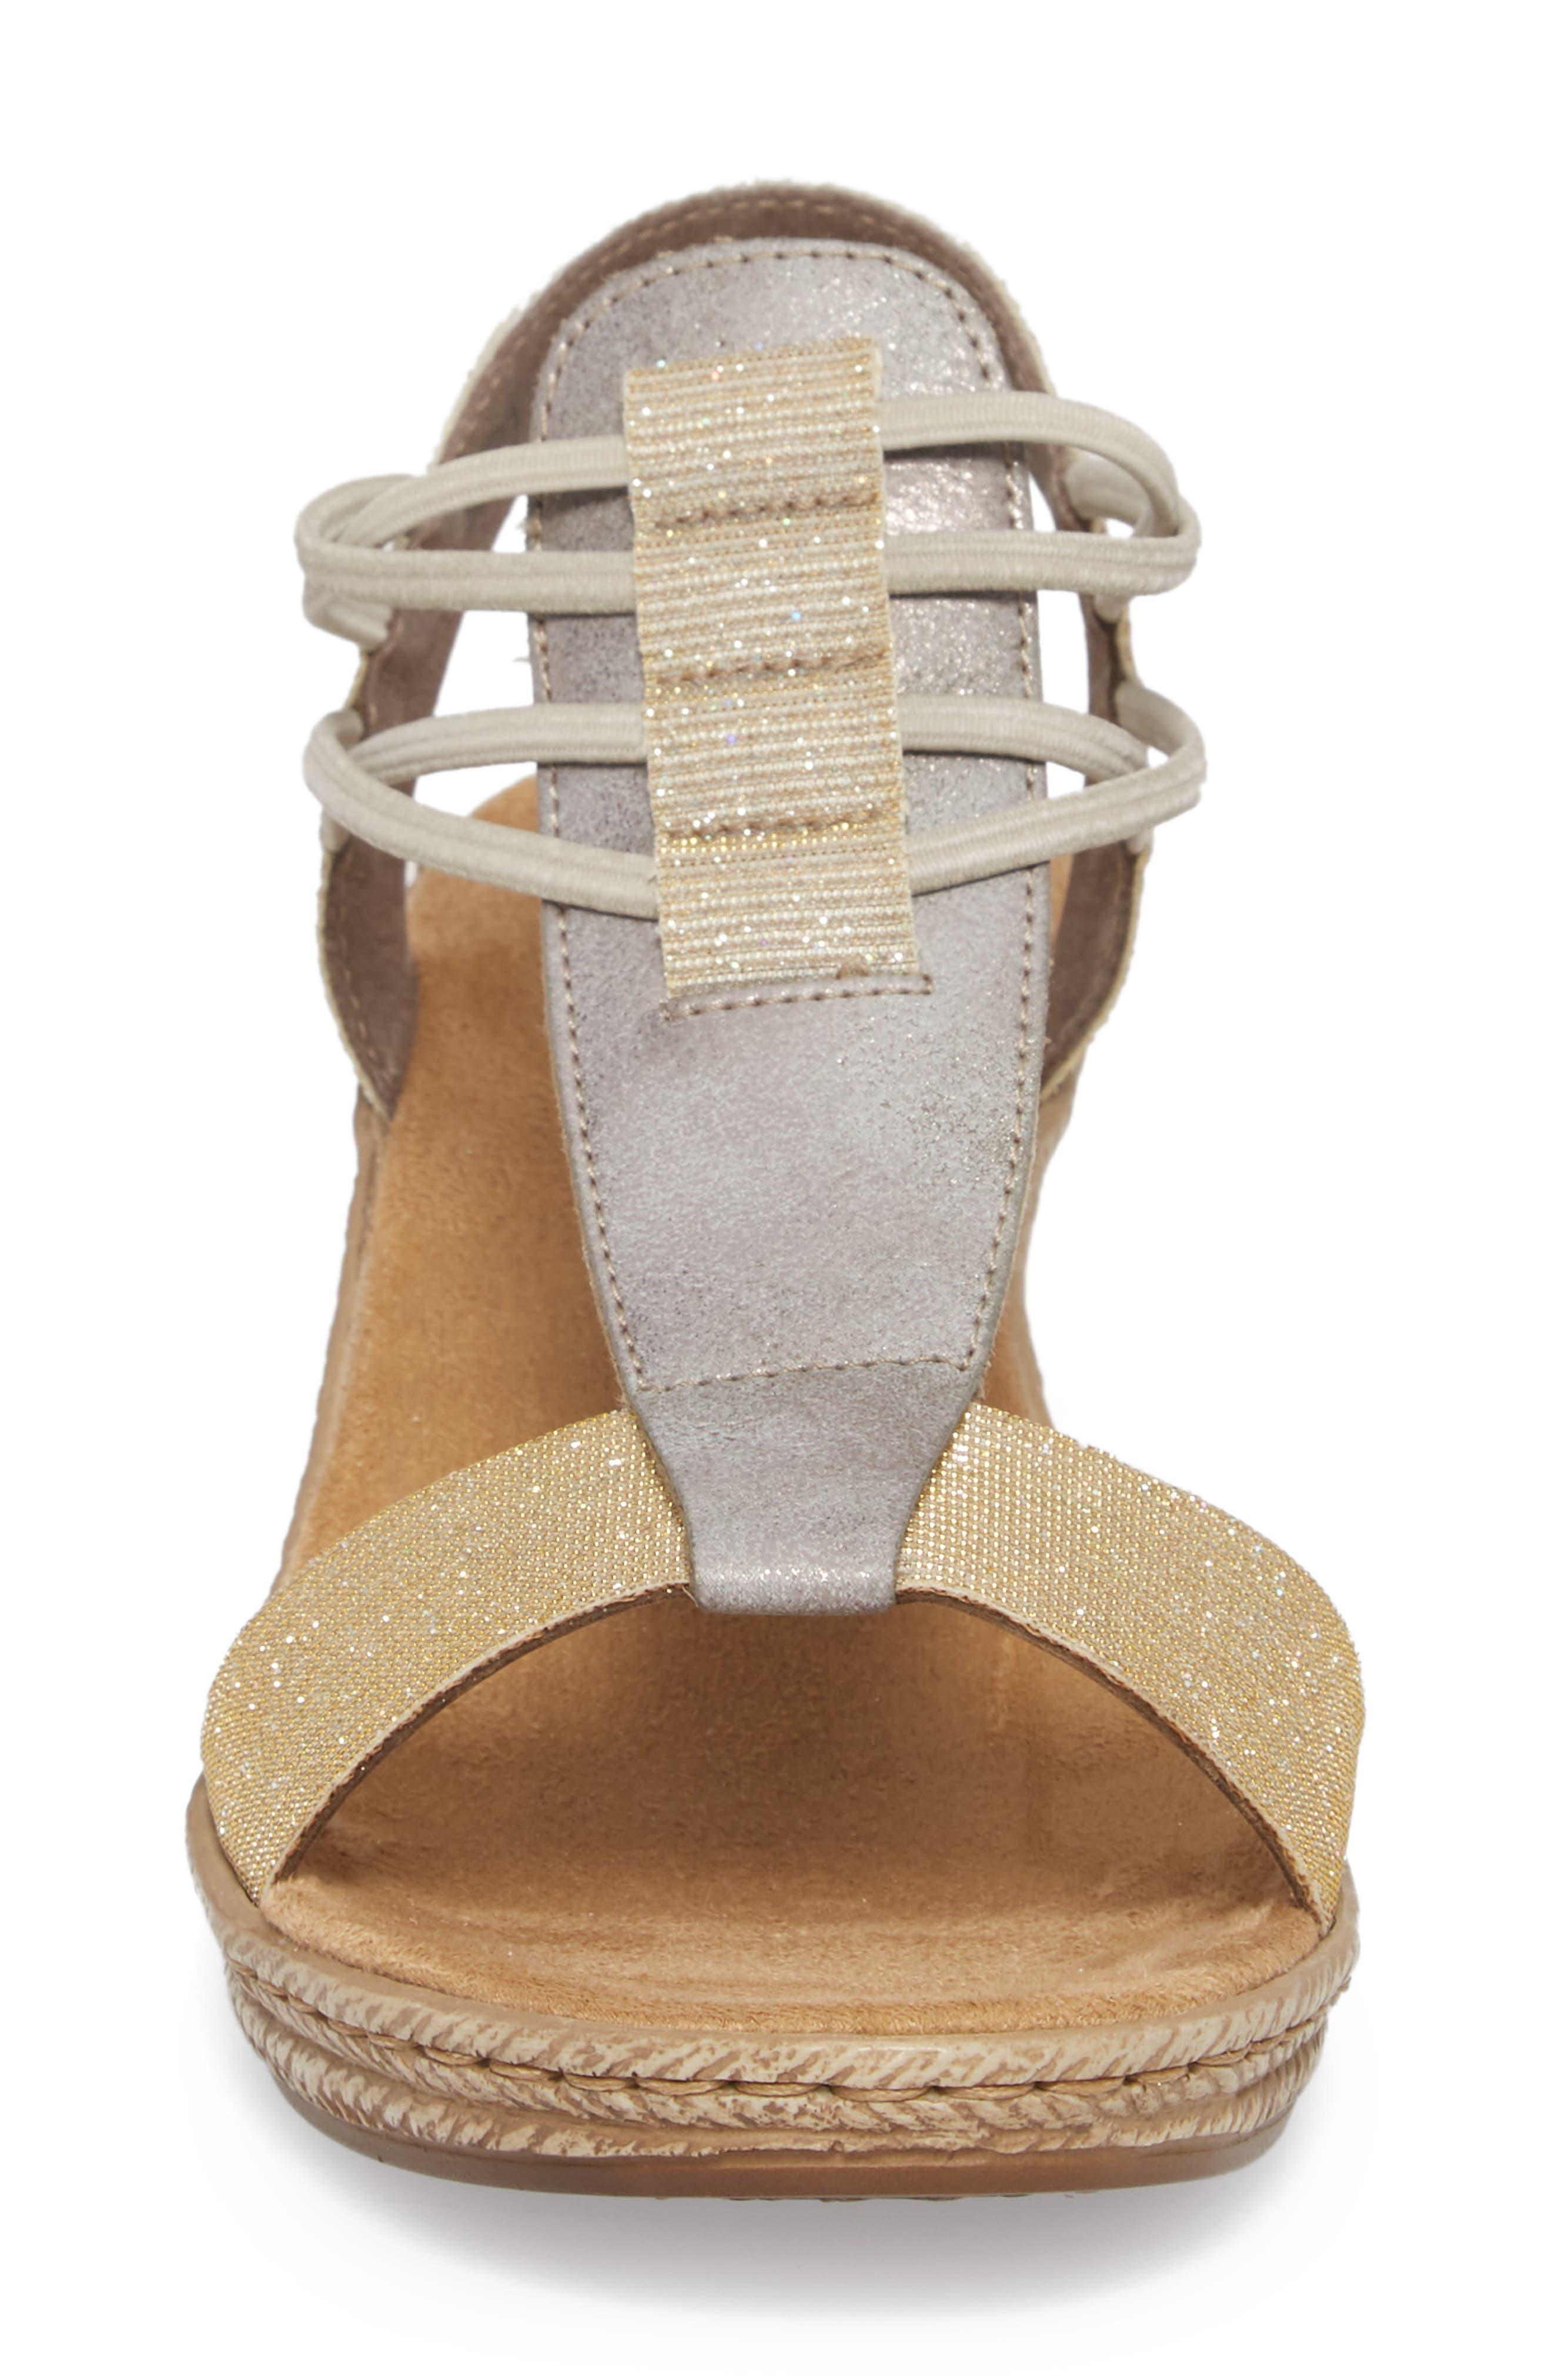 Fanni 22 Espadrille Wedge Sandal,                             Alternate thumbnail 4, color,                             Light Gold/ Grey Fabric